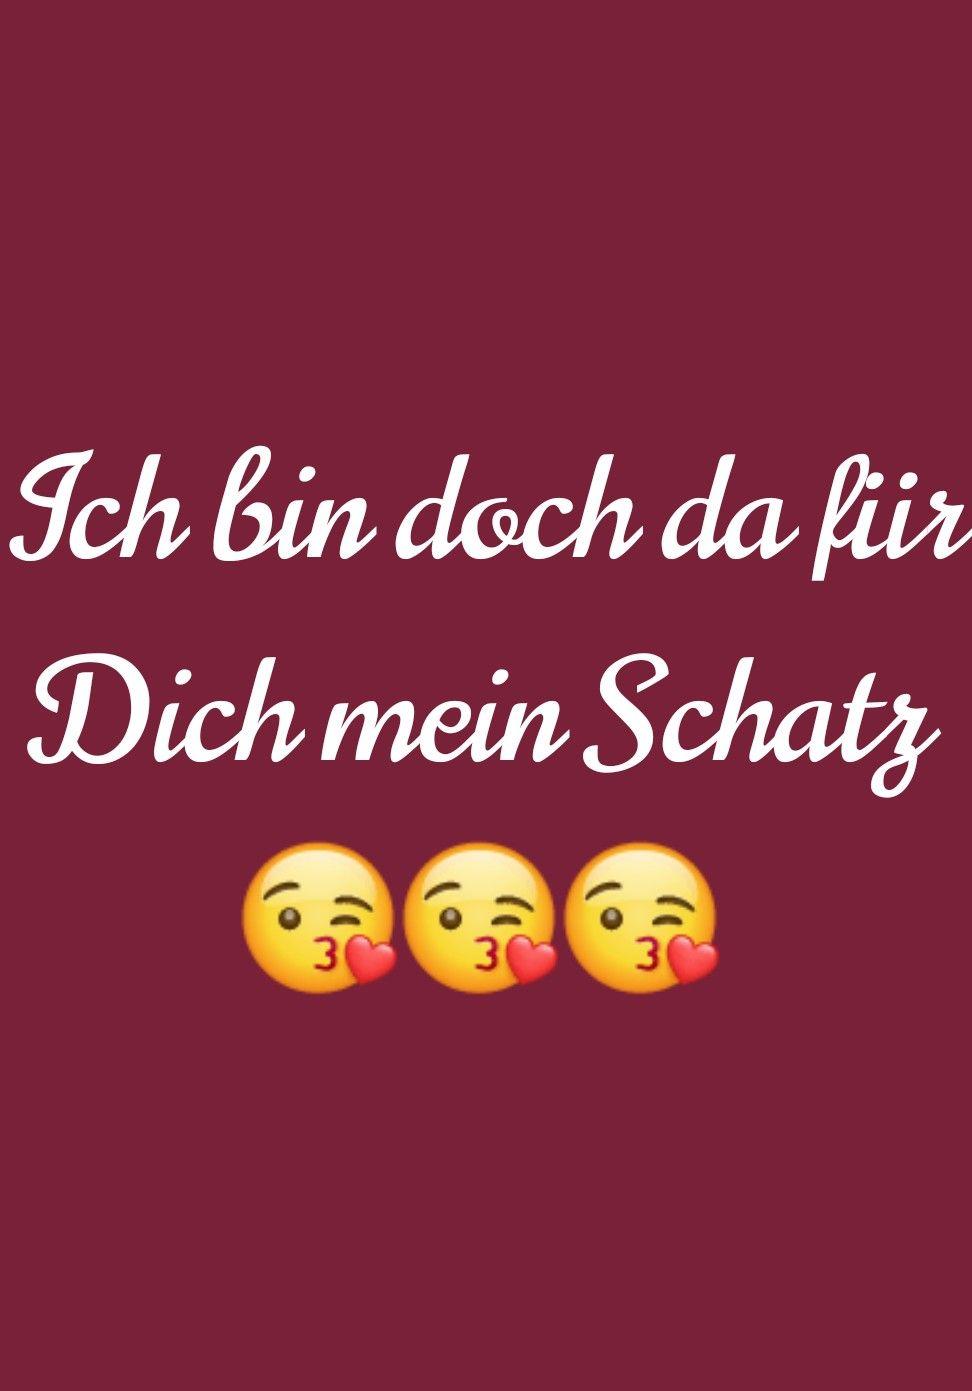 Whatsapp Status Verliebt Tumblr Whatsapp Status Sprüche